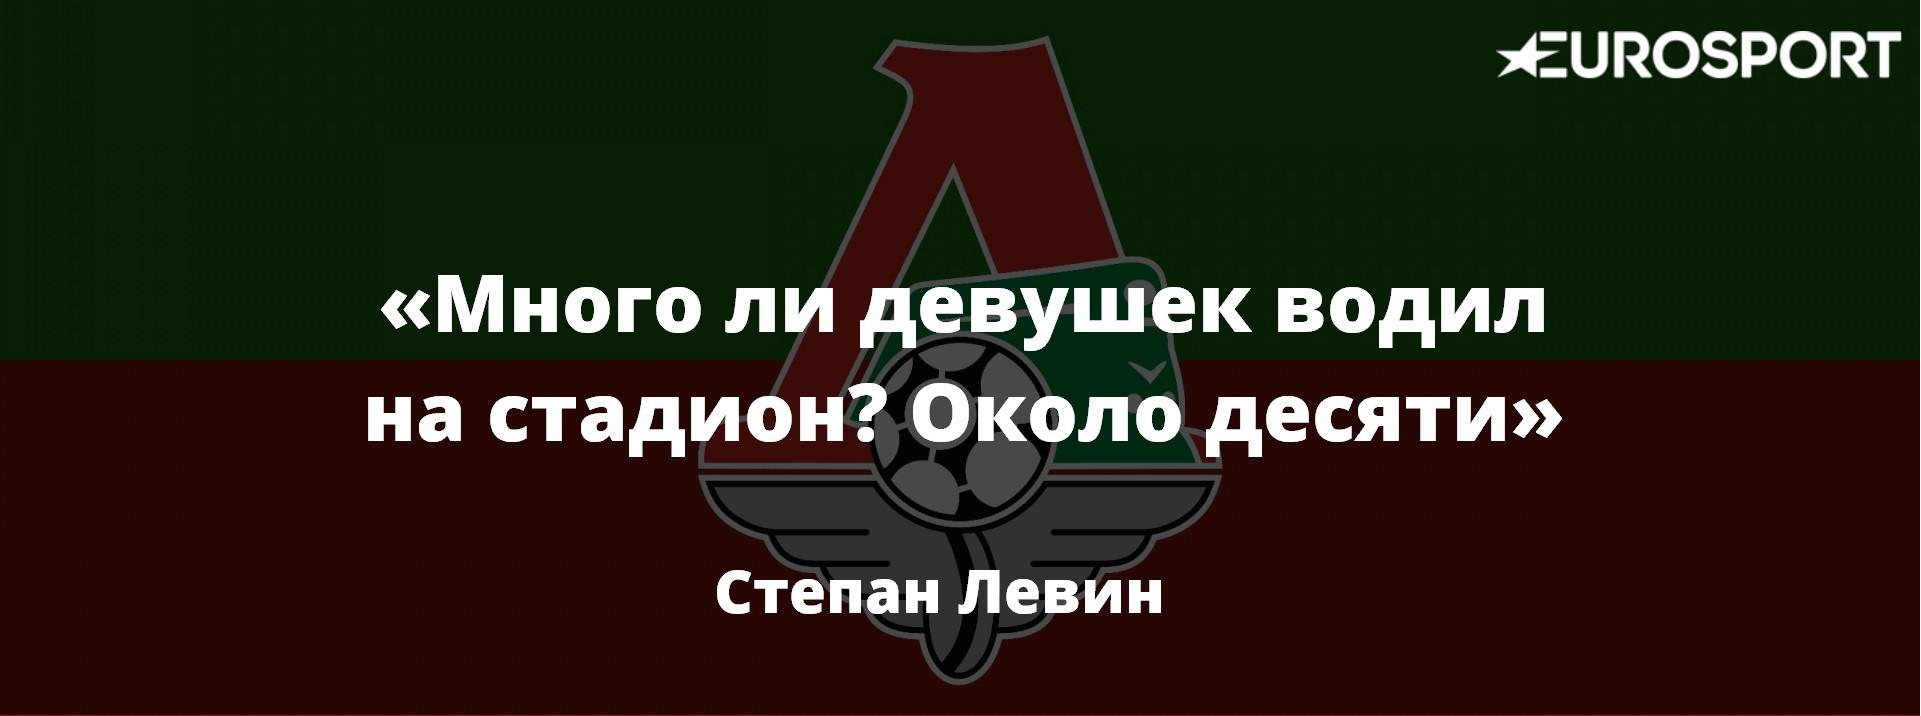 Cтепан Левин